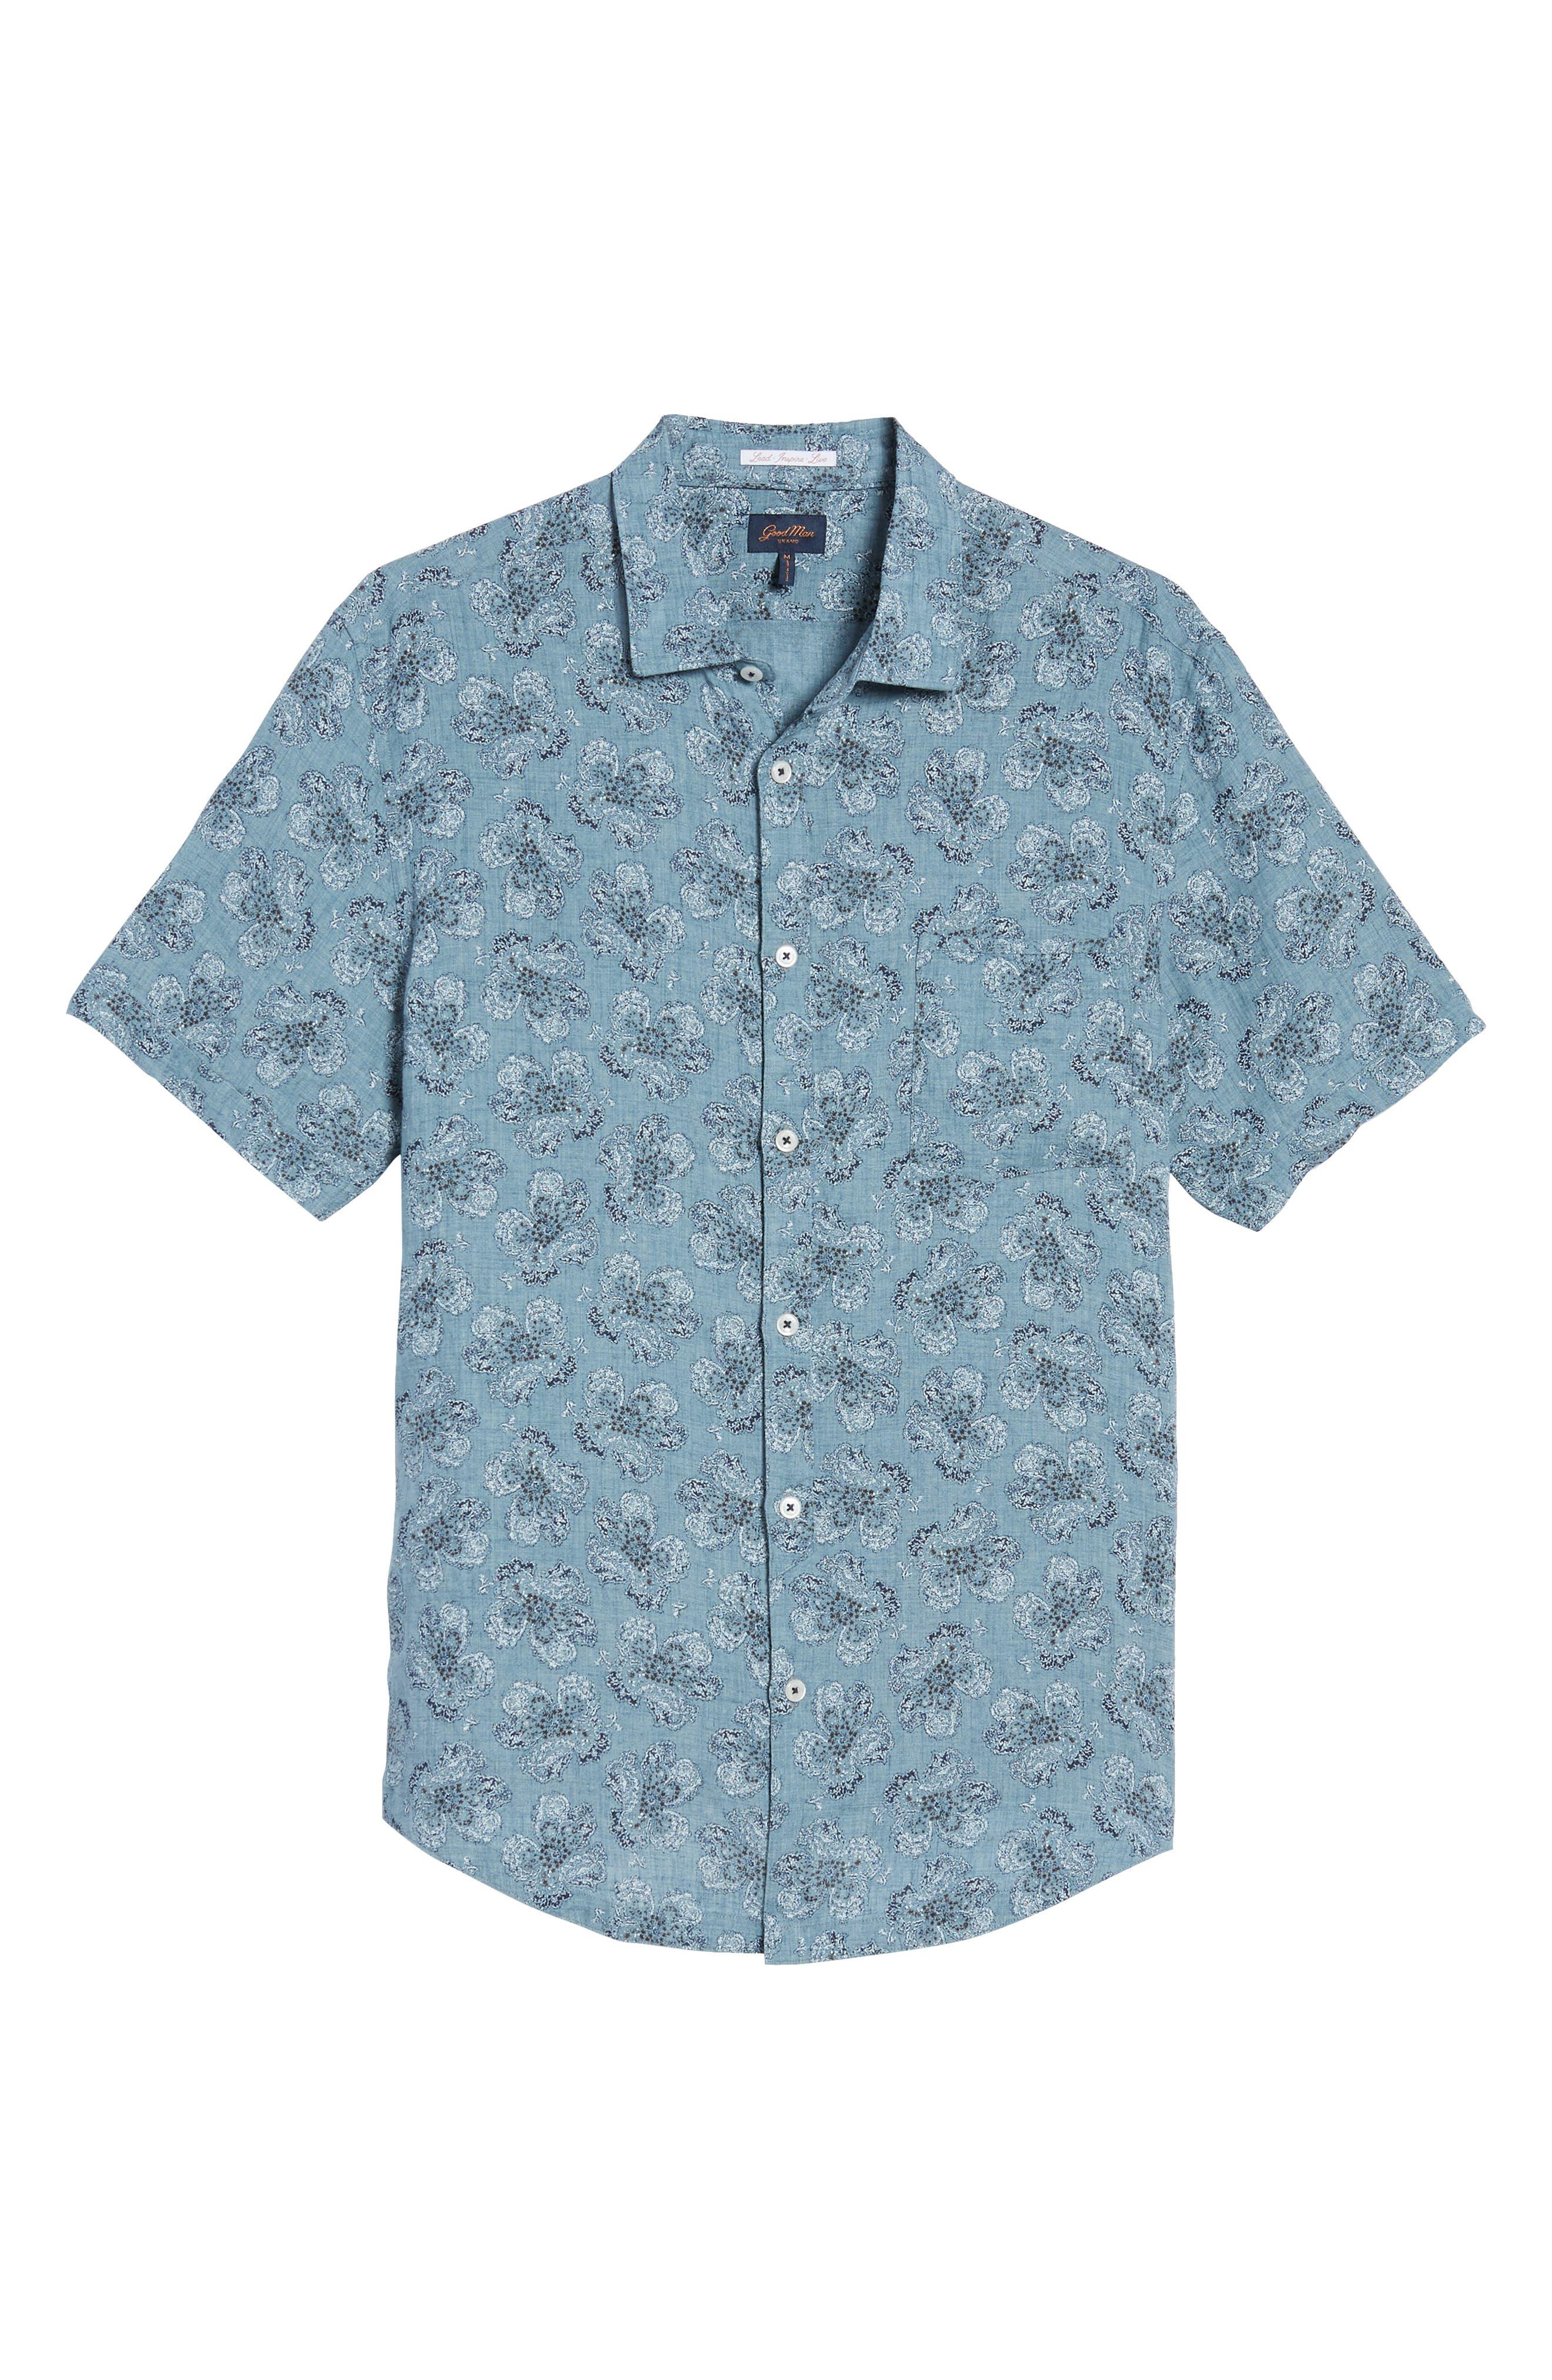 Tokyo Slim Fit Floral Short Sleeve Sport Shirt,                             Alternate thumbnail 6, color,                             INDIGO